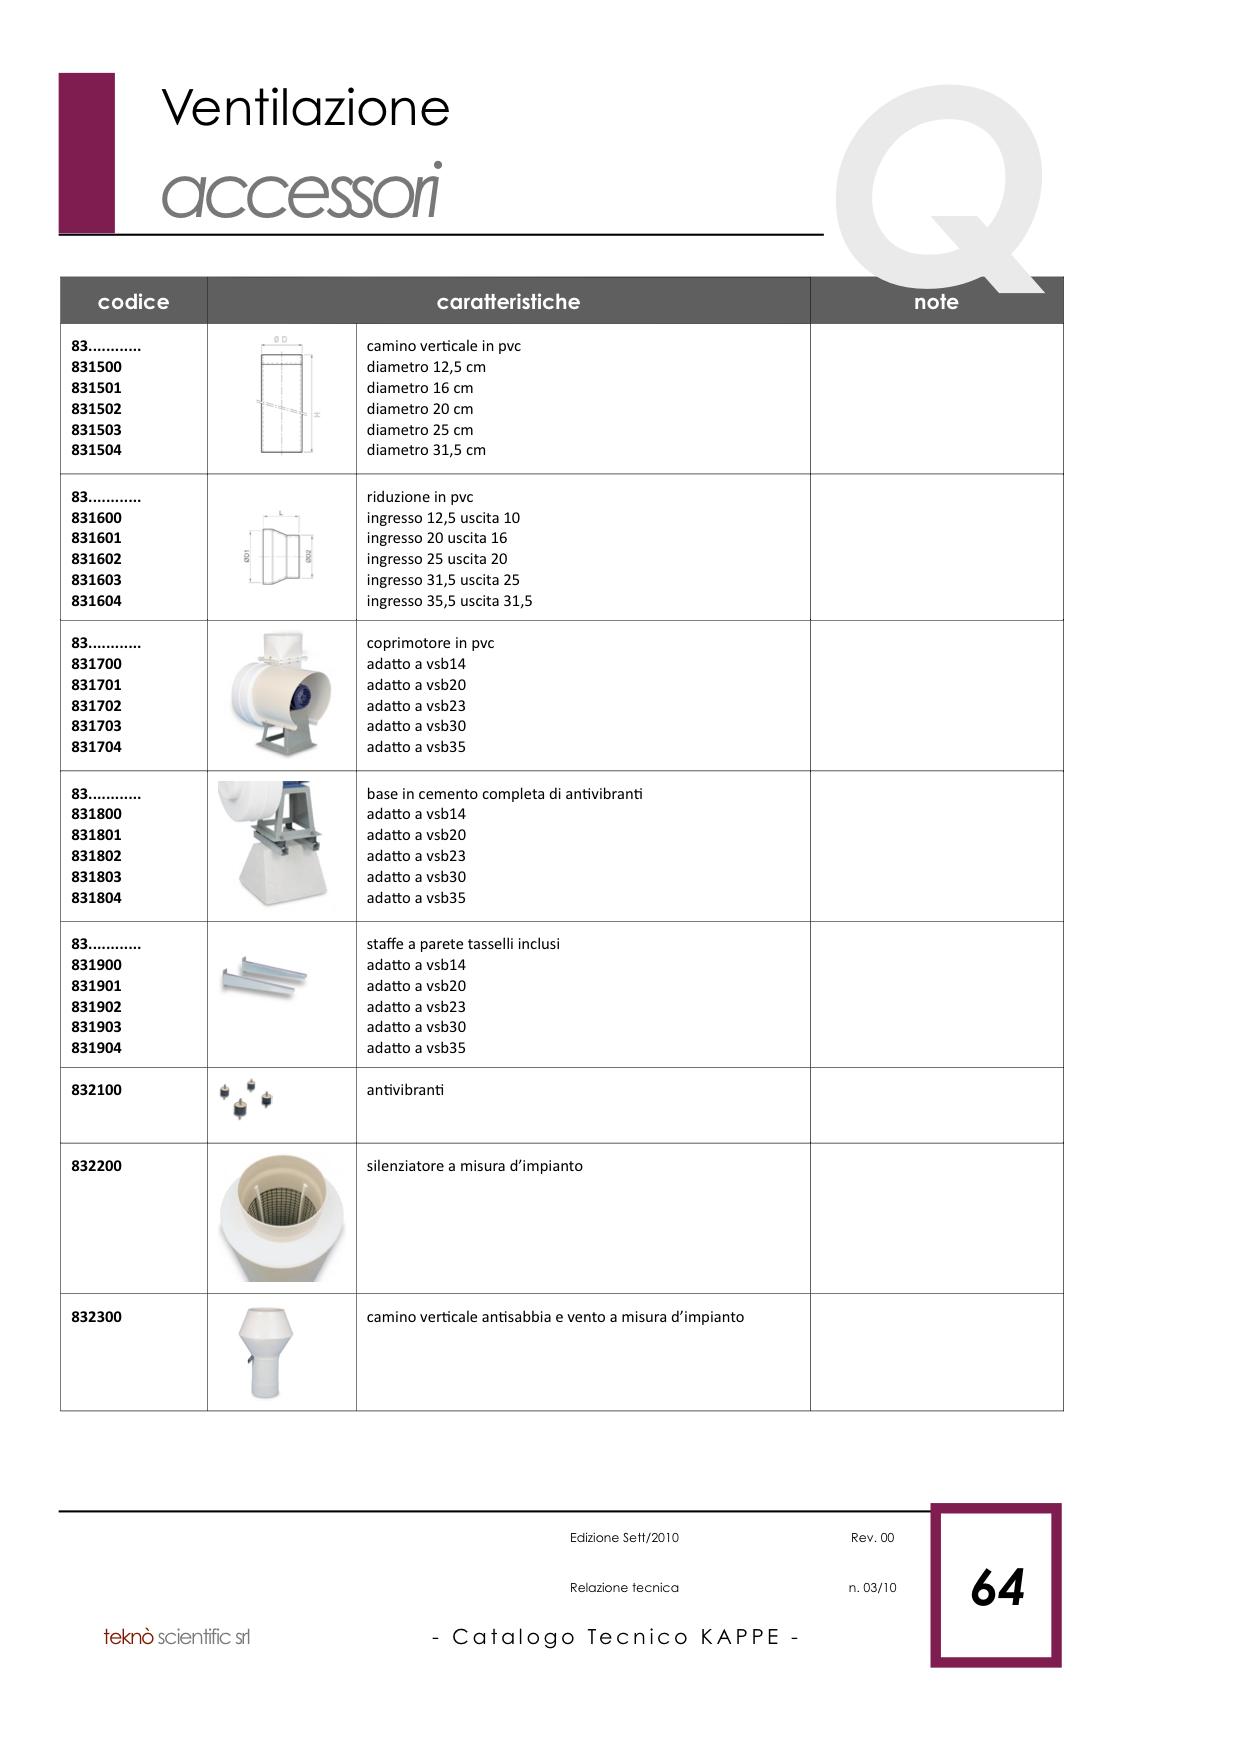 KAPPE Catalogo Tecnico Generale copia 4.png